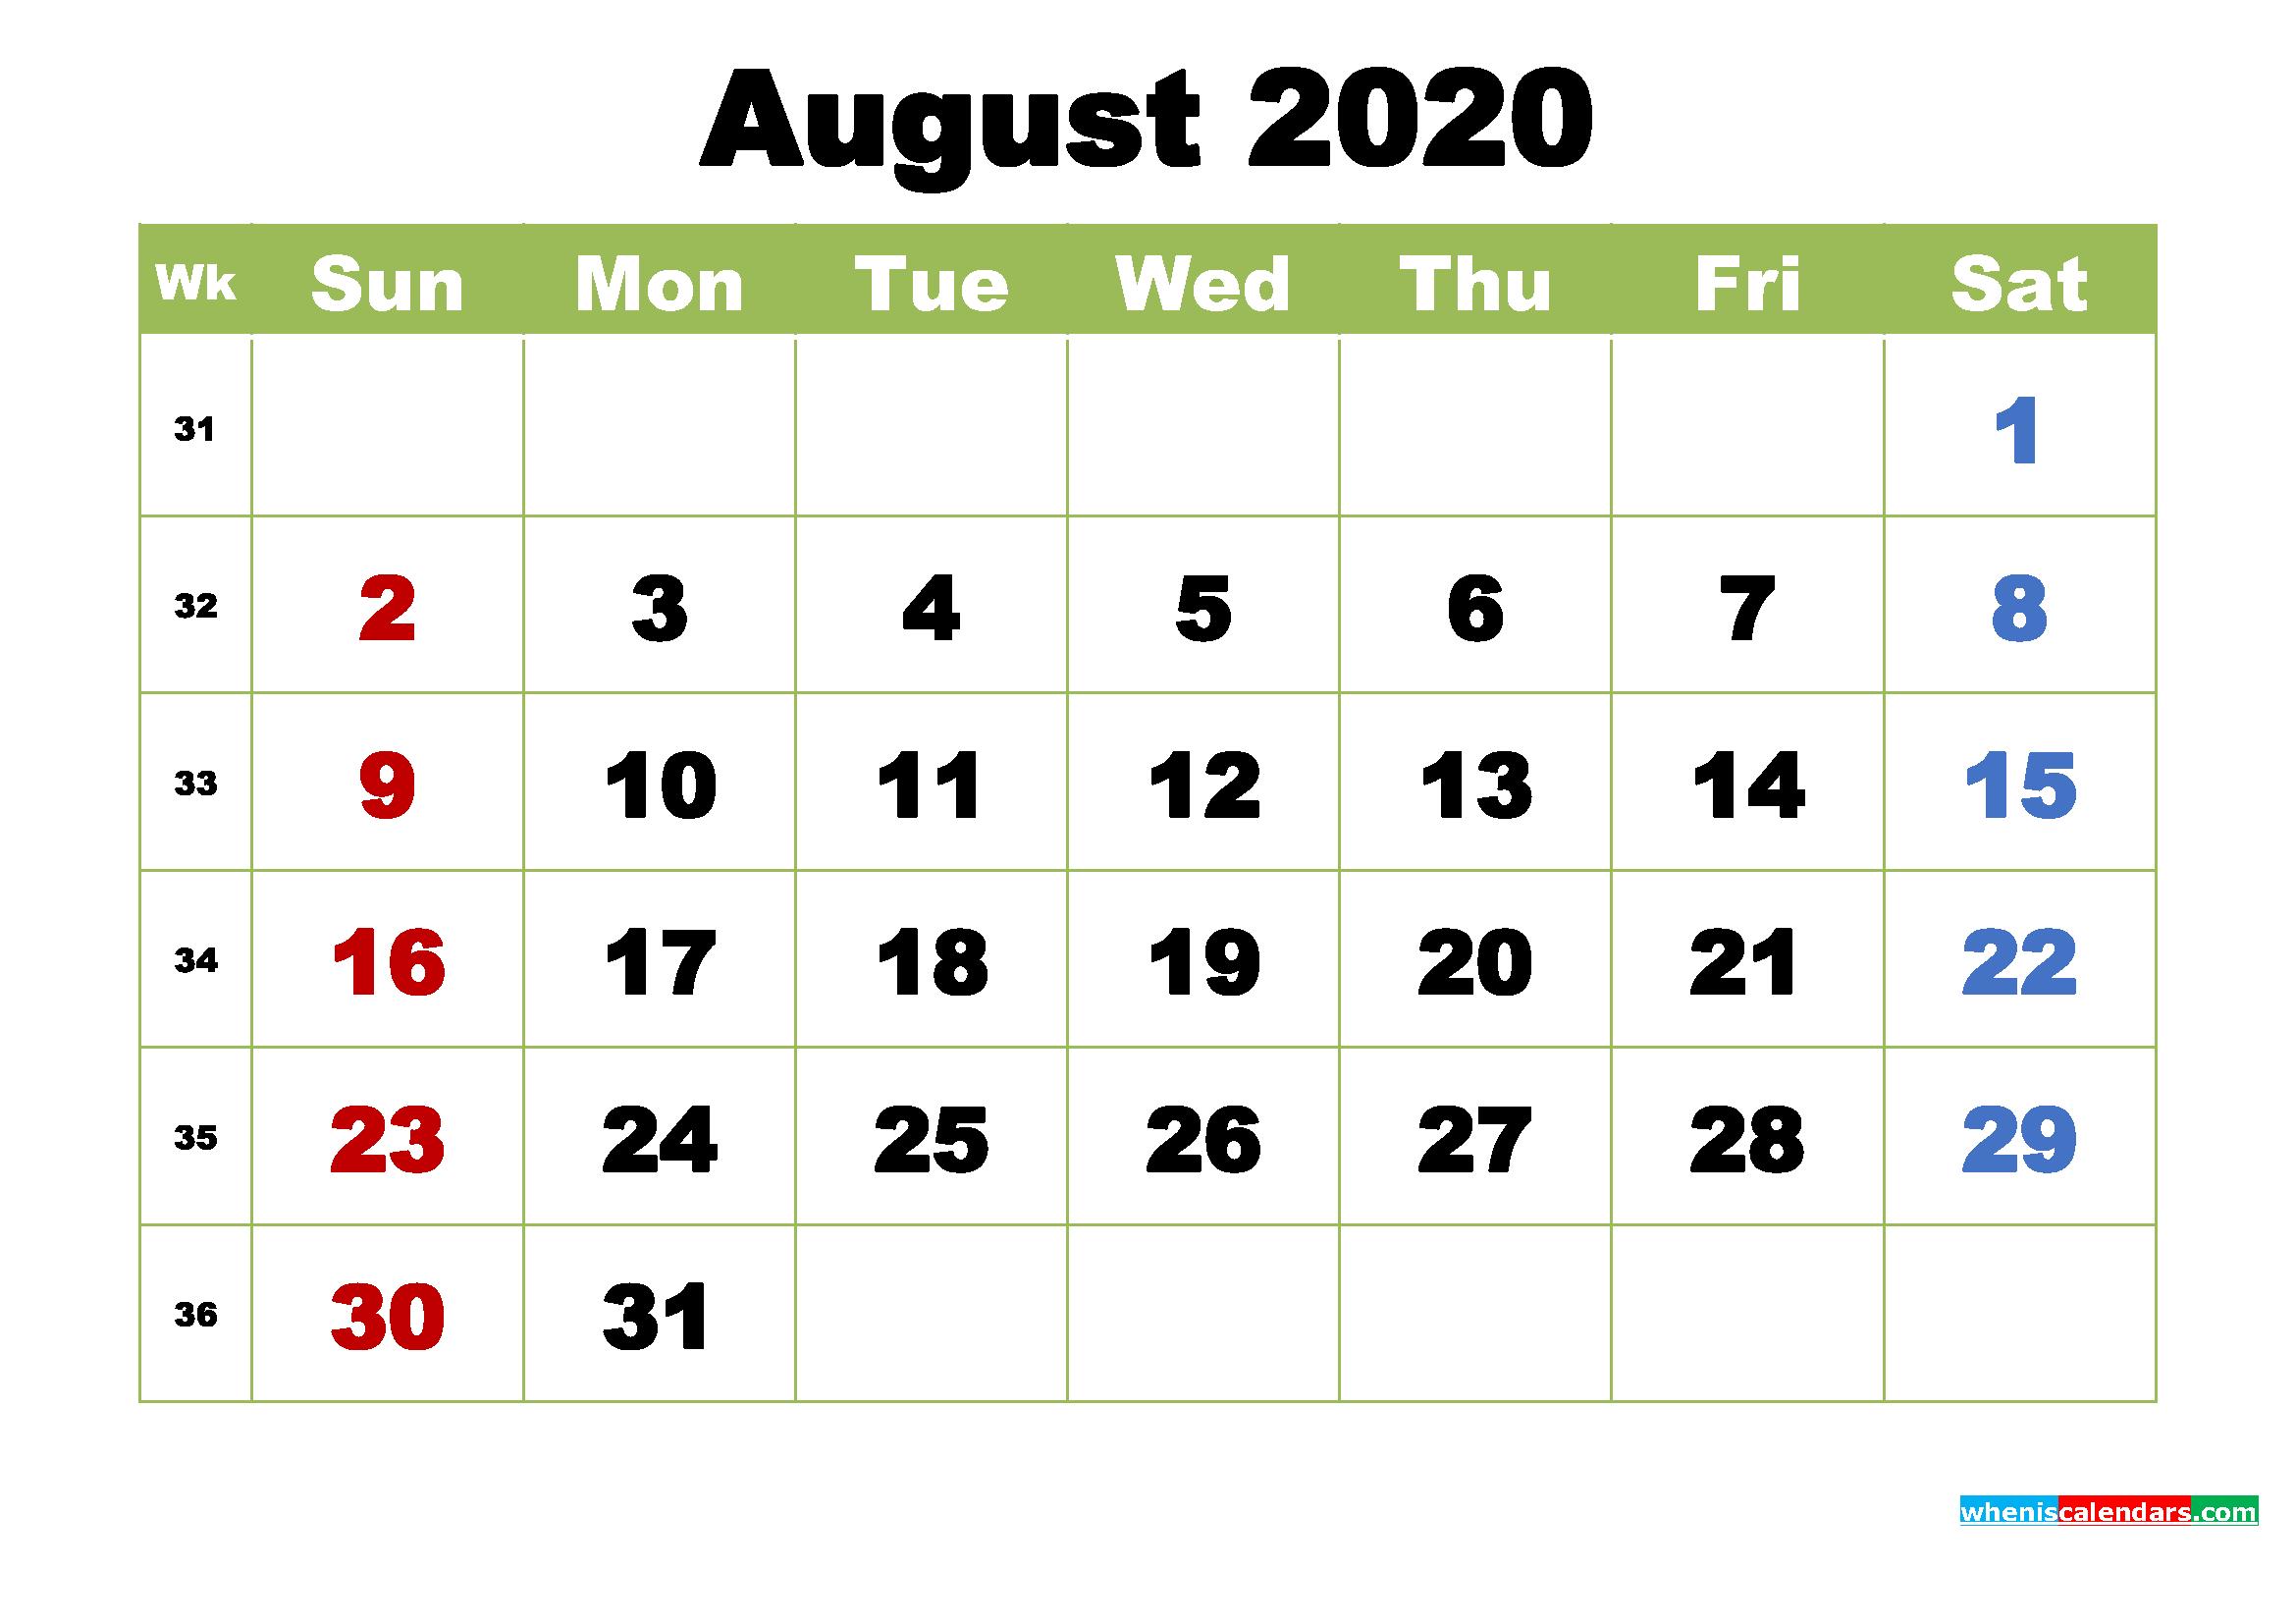 August 2020 Desktop Calendar with Holidays